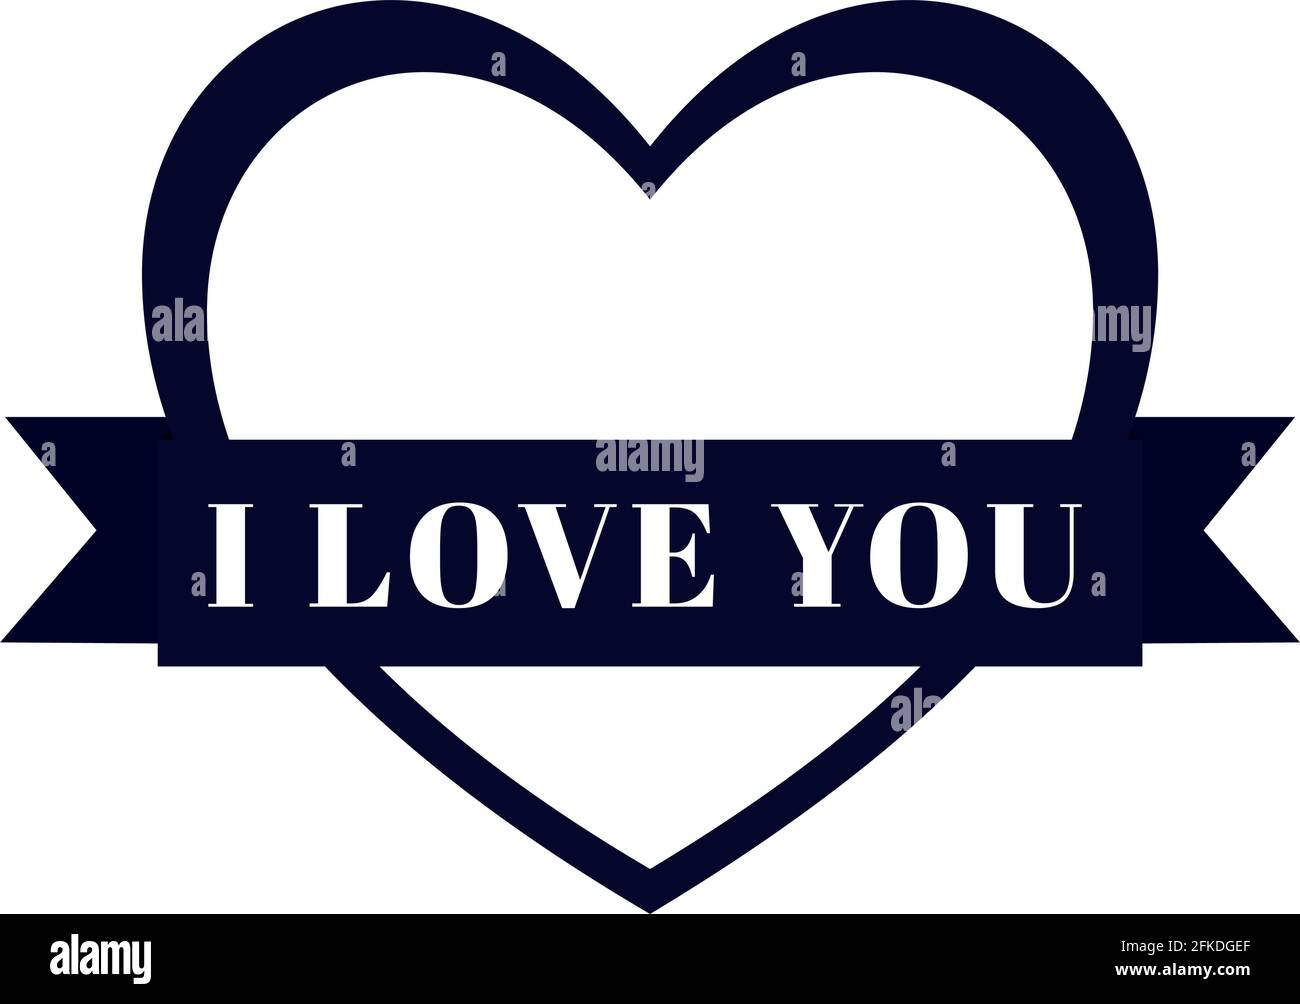 Ich liebe dich Stock Vektor